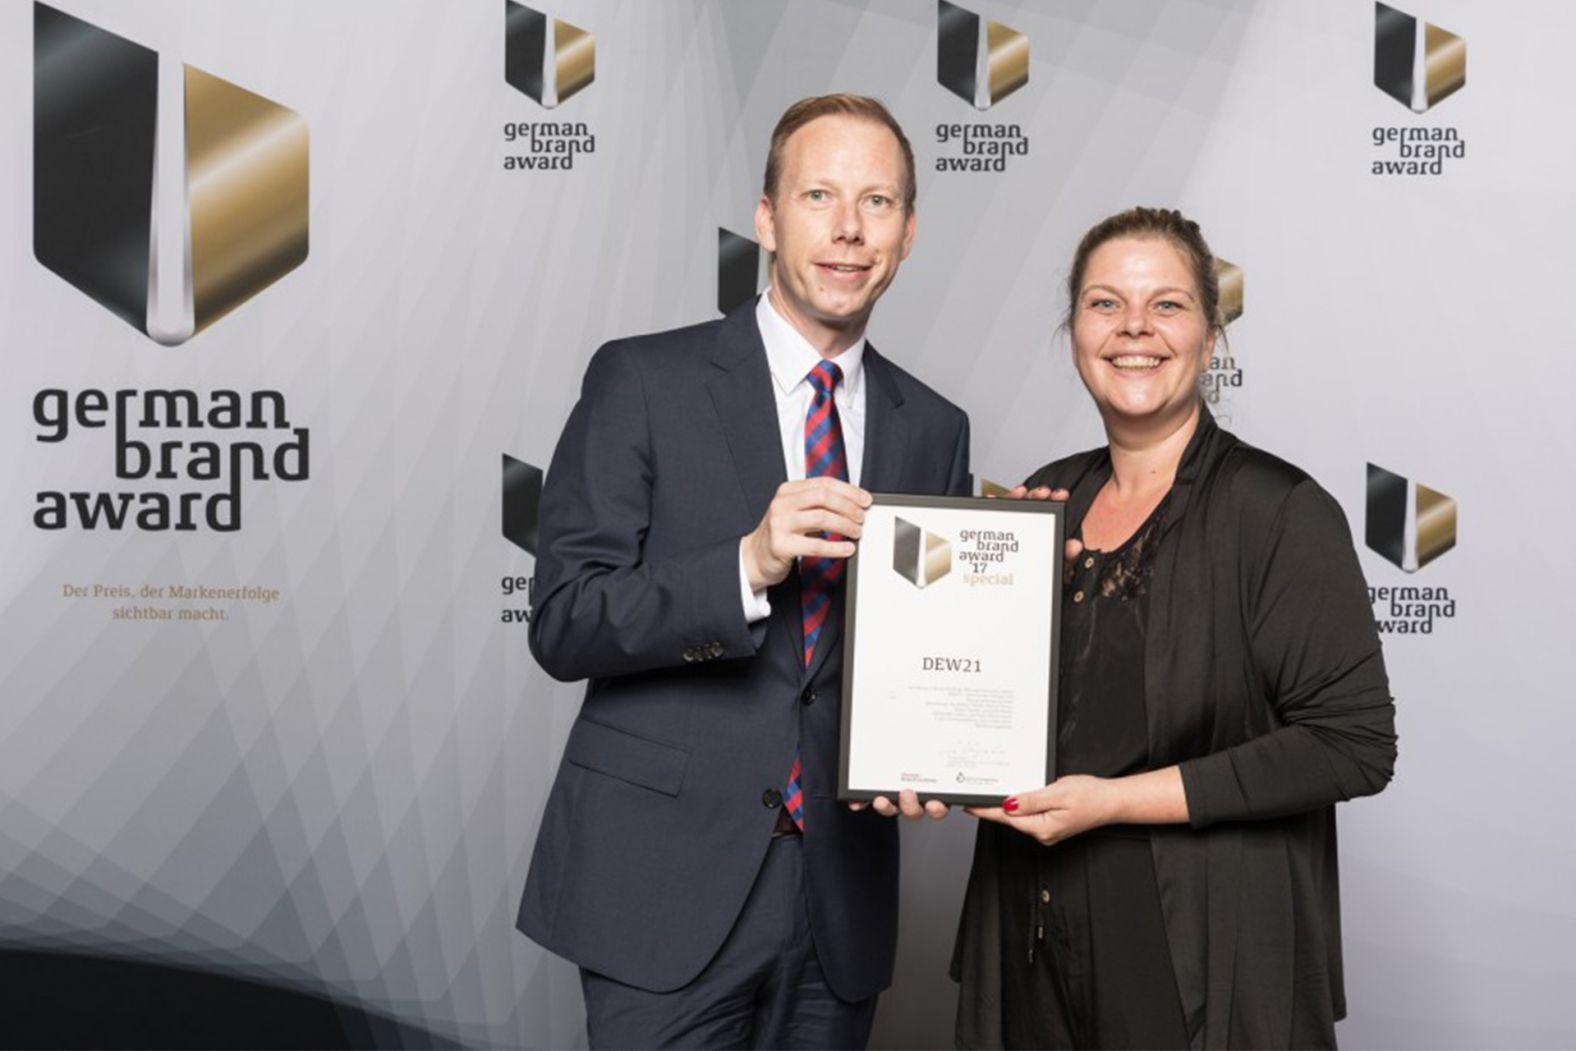 German Brand Award DEW21.